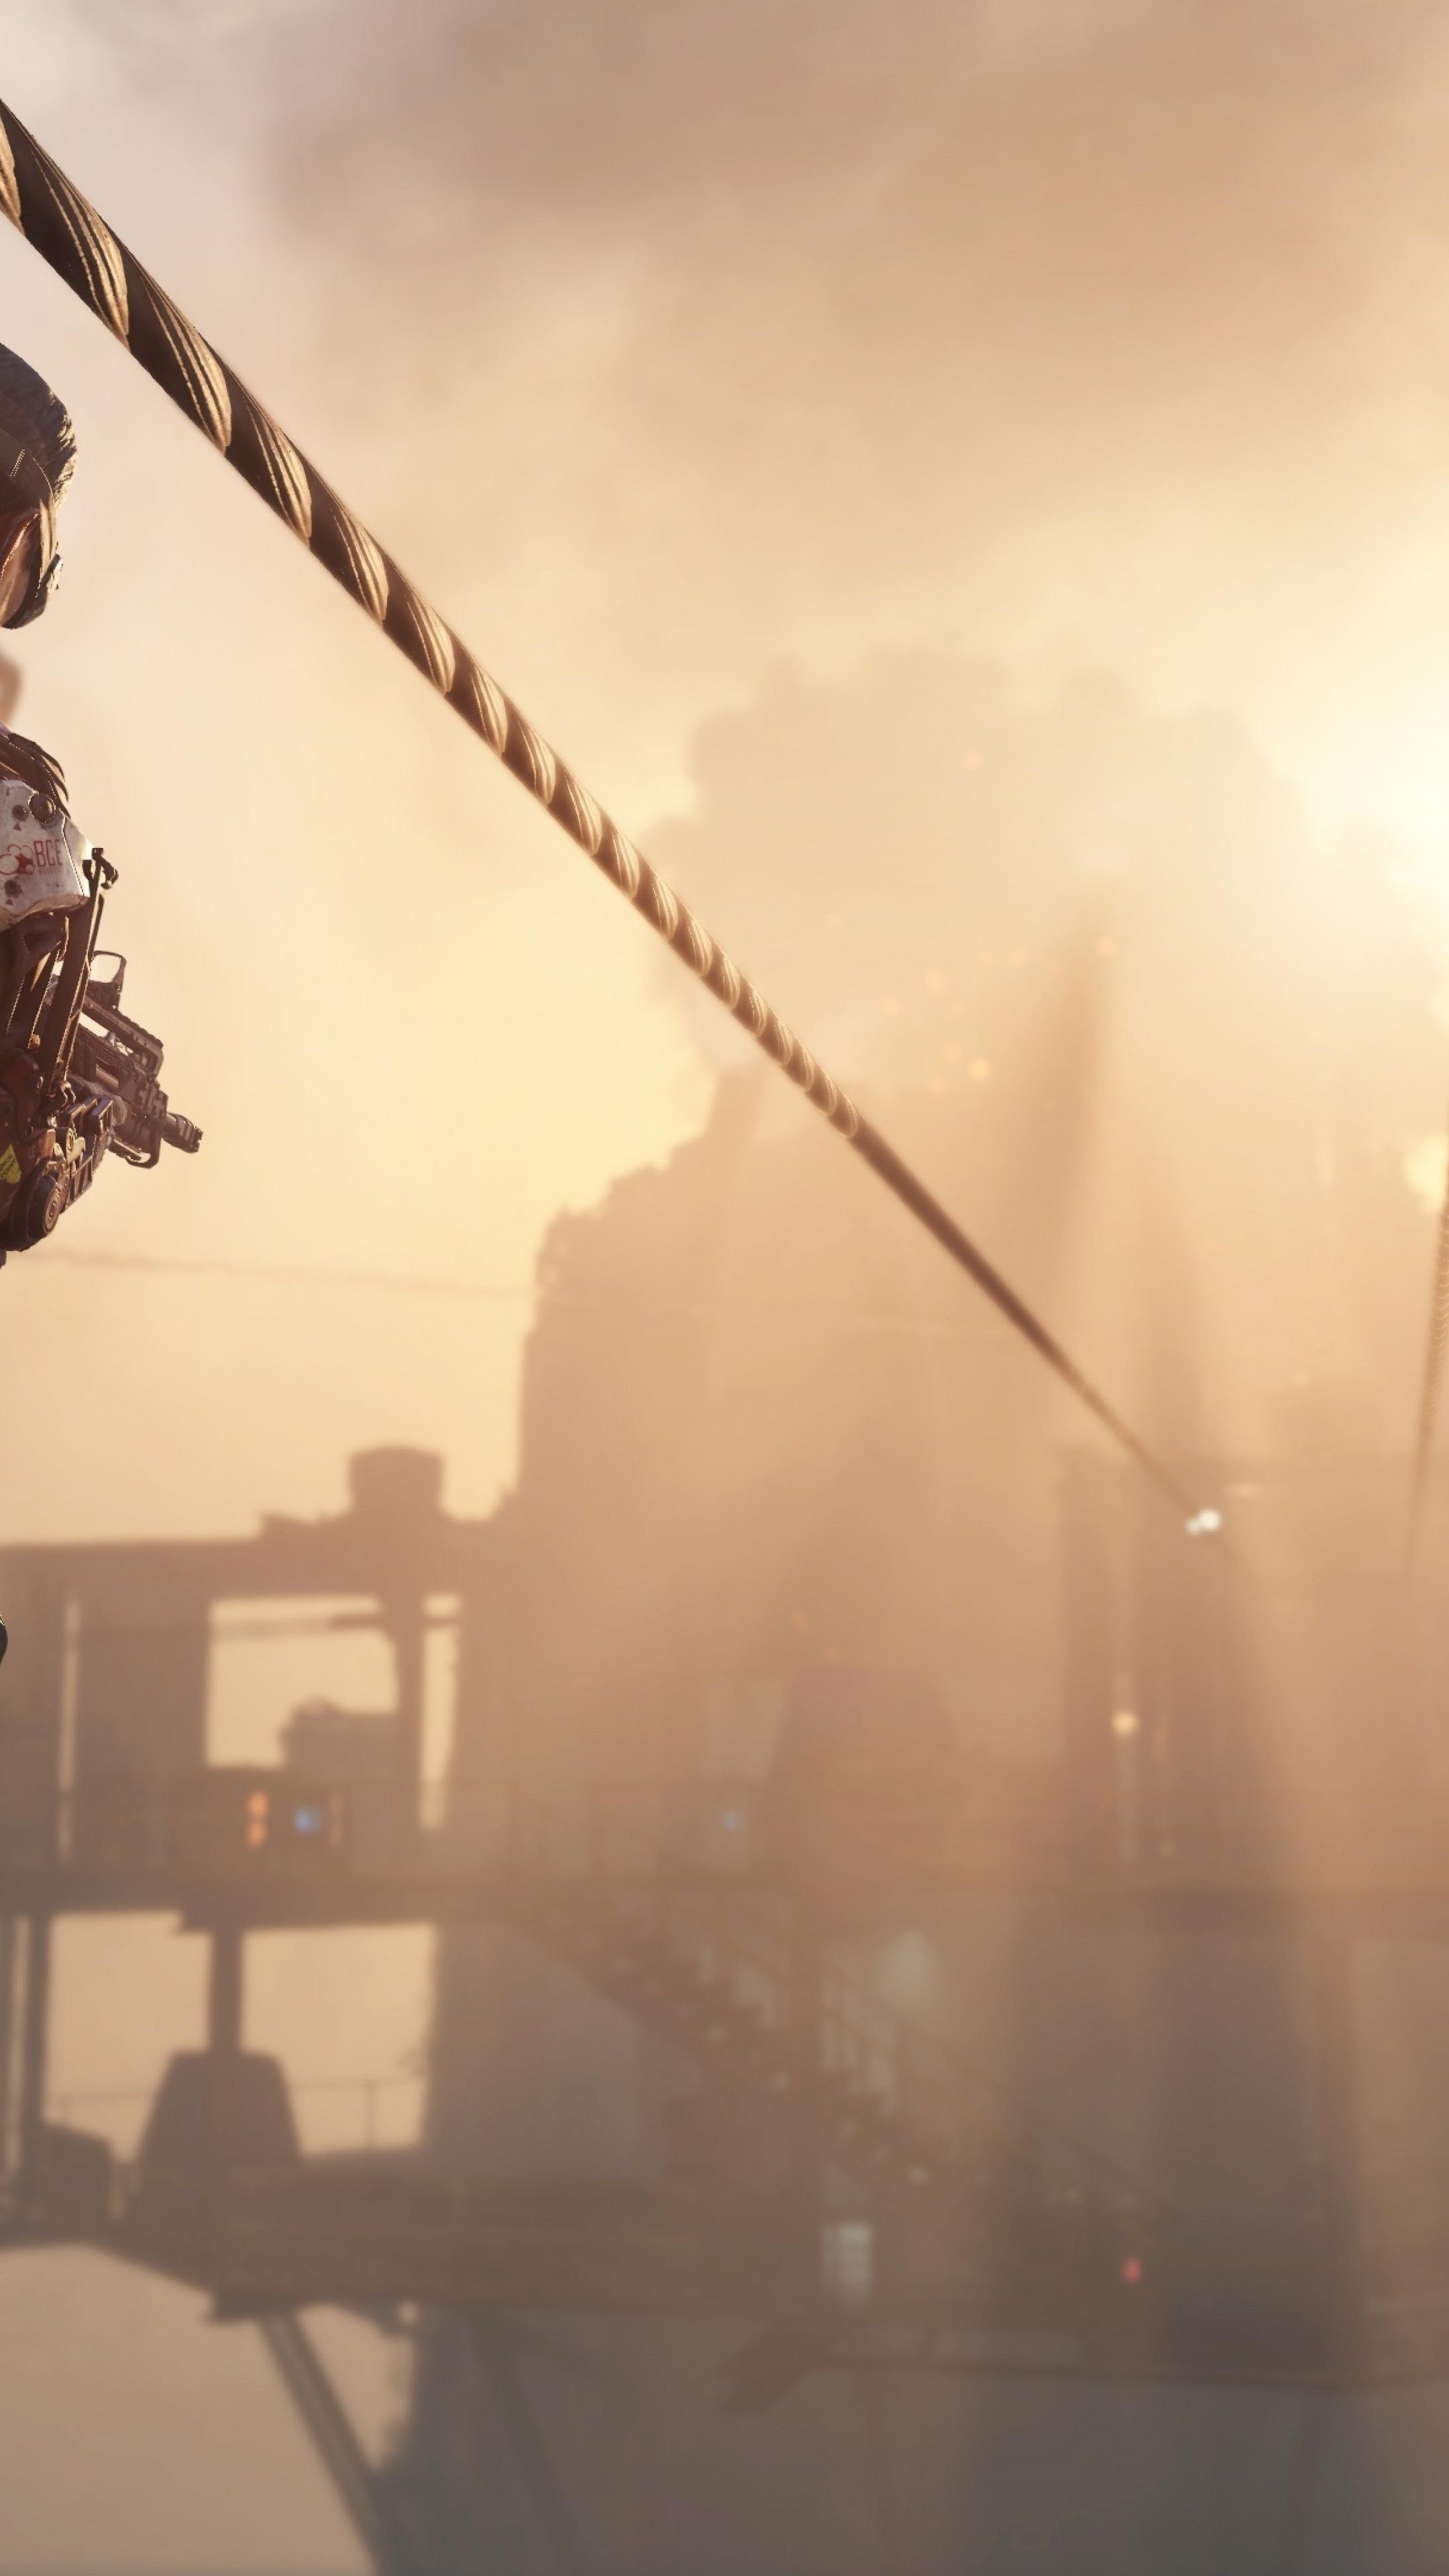 Call Of Duty Black Ops 3 Gameplay, HD 4K Wallpaper